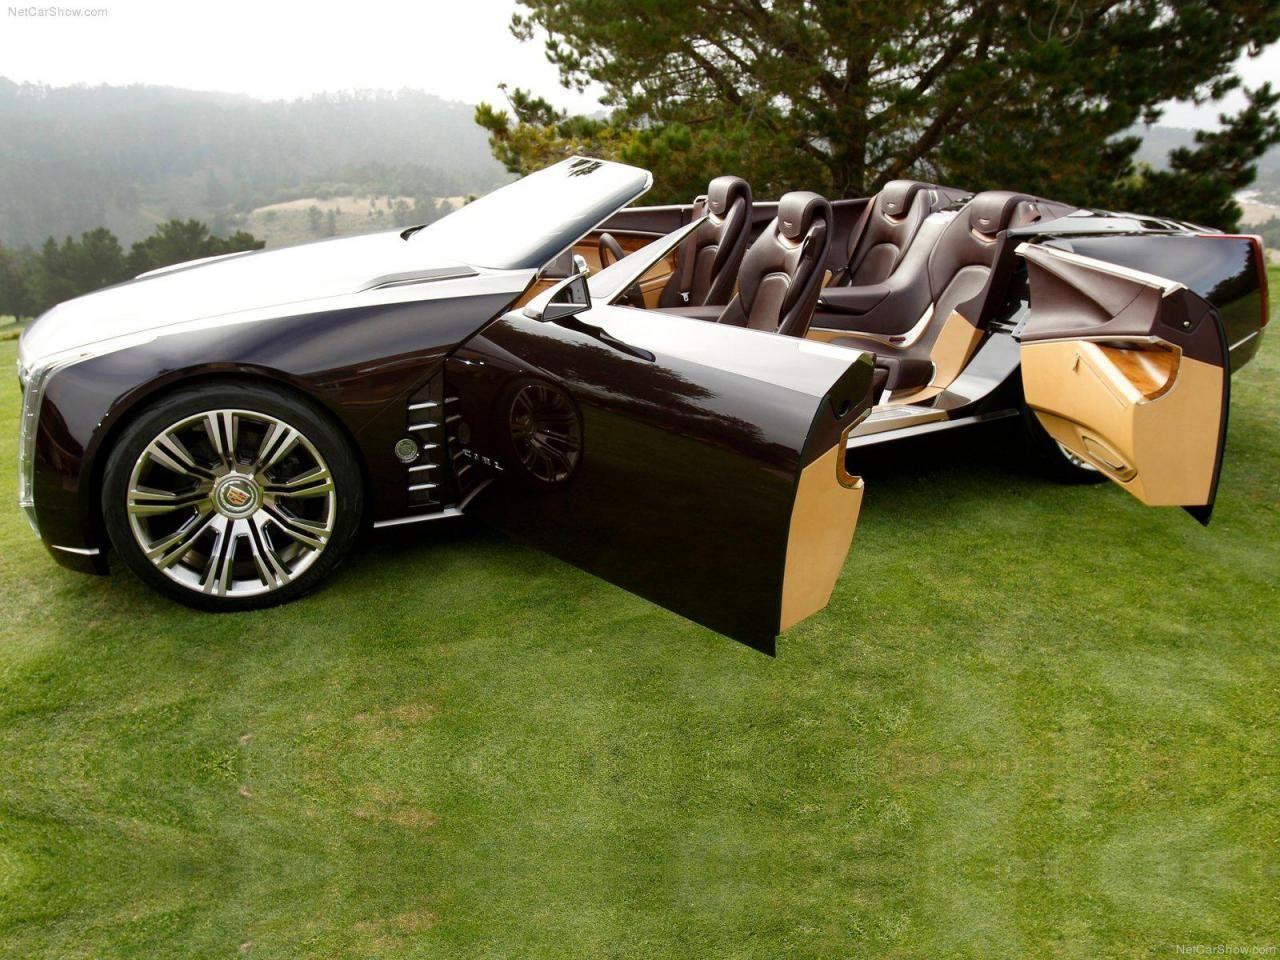 Cadillac Ciel Concept Concept Cars Pinterest Cars Cadillac